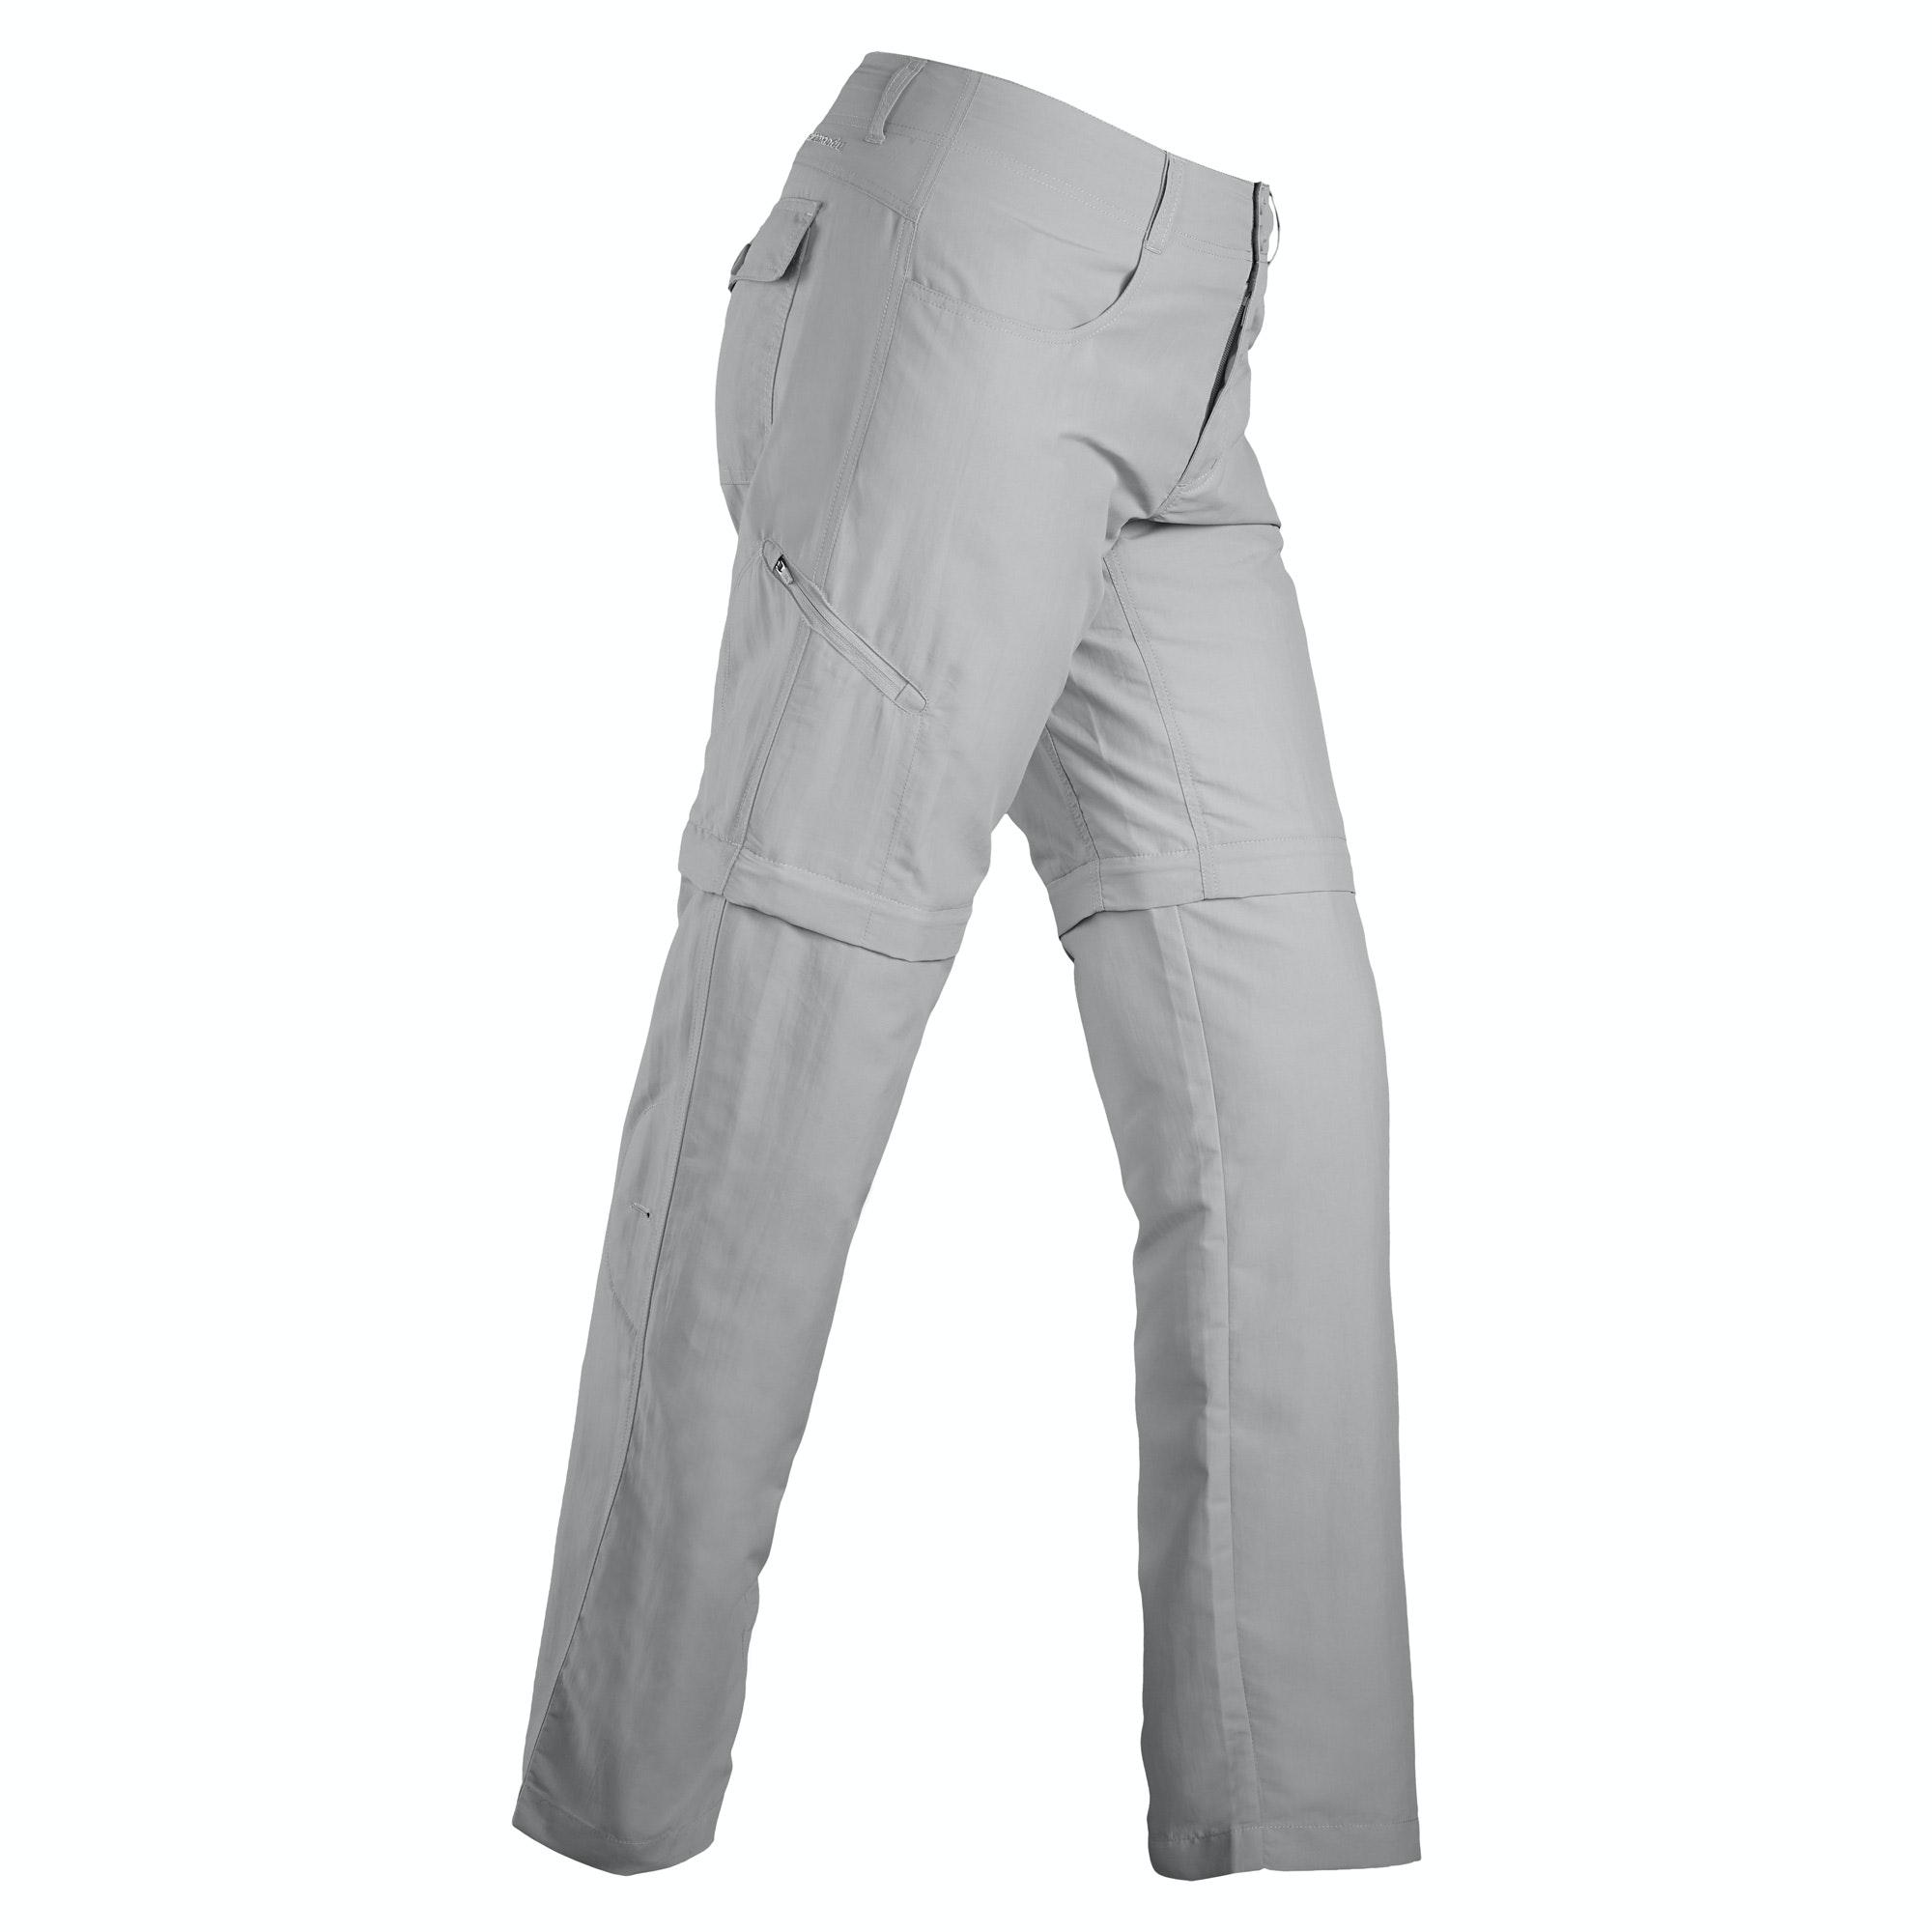 Kathmandu Batangsi Nfz Womens Buzzguard Travel Hiking Pants Trousers V3 Grey Ebay